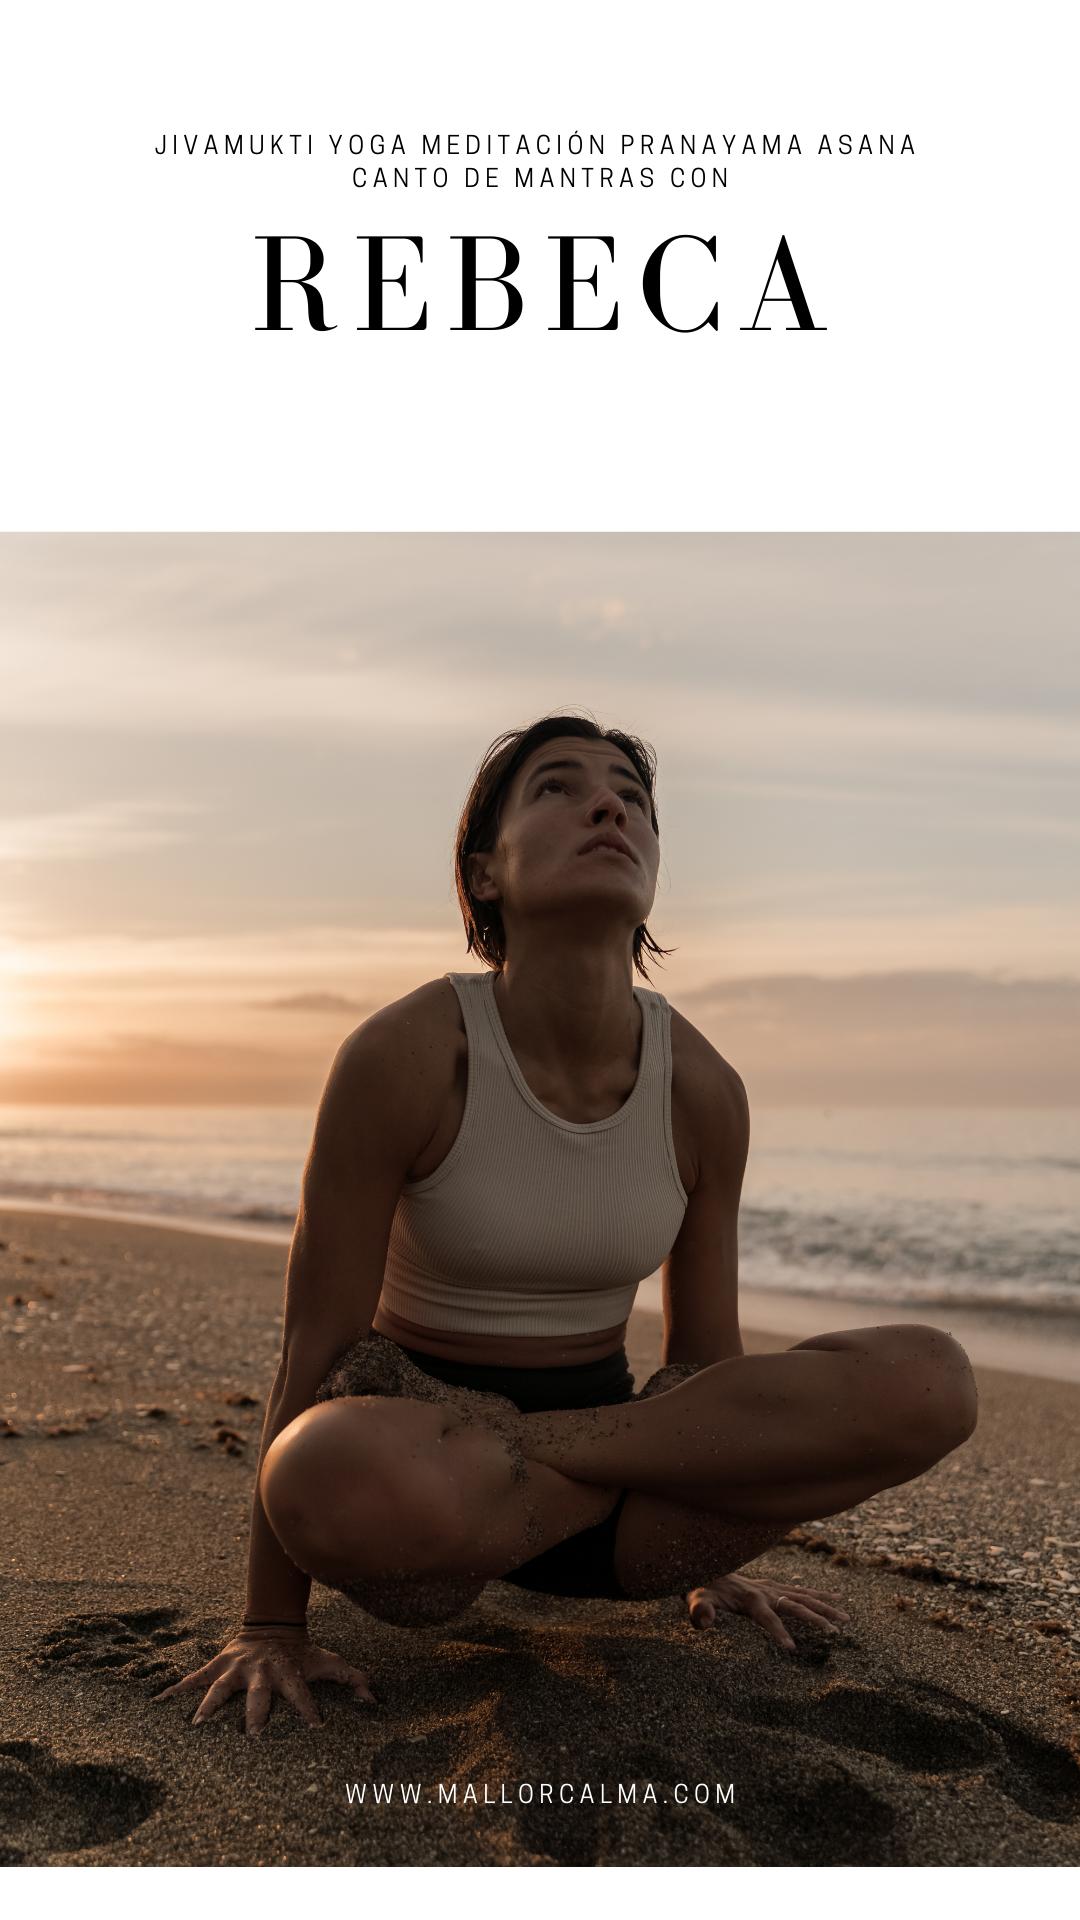 retiro jivamukti yoga retreat rebeca recatero mallorca osa major finca meditacion teacher nature naturaleza campo mayo may 2021 buddha yogashala asana pranayama vegan healthy elements